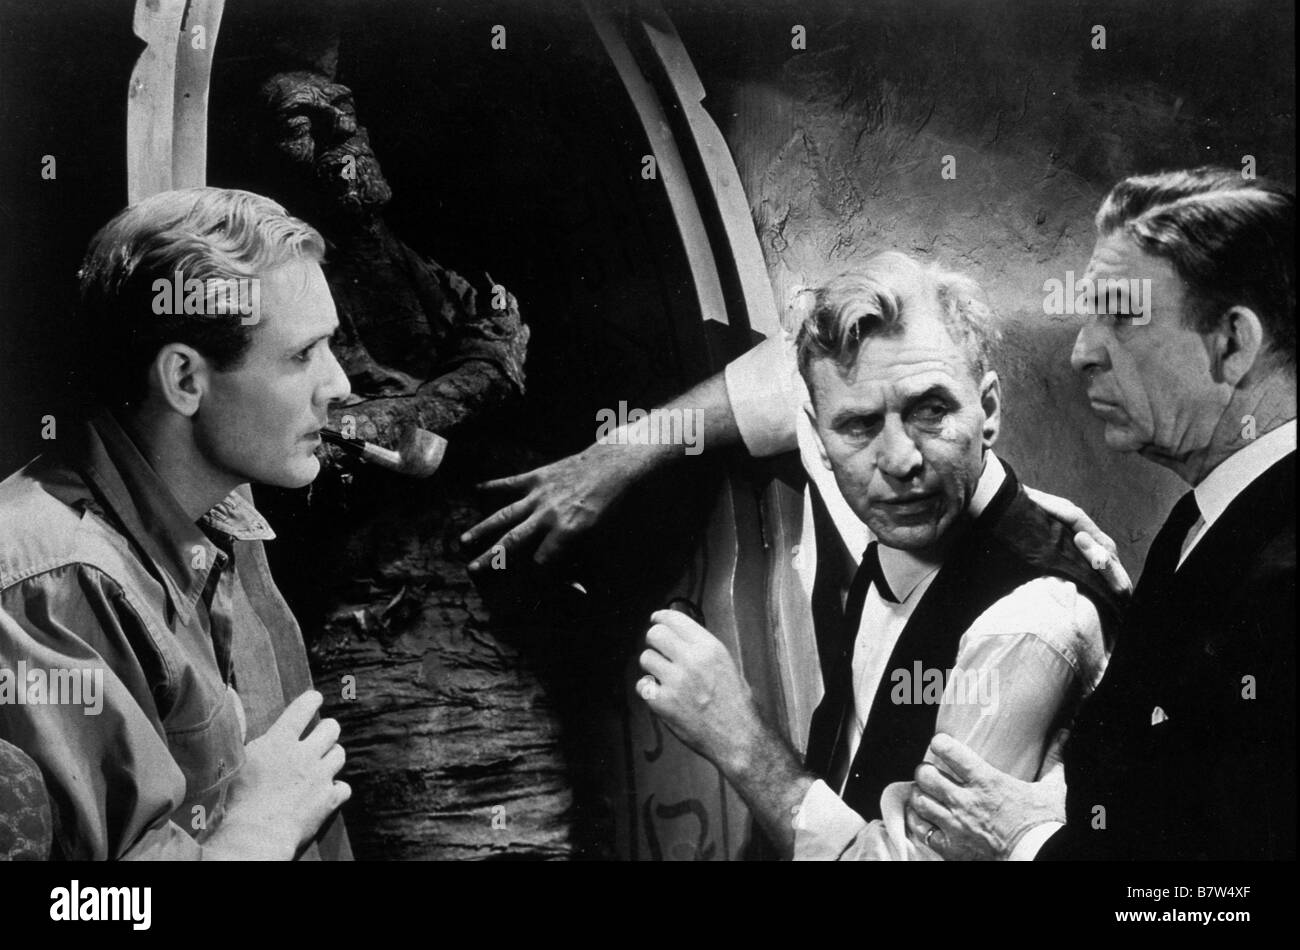 The Mummy Year: 1932 USA Director: Karl Freund Boris Karloff - Stock Image